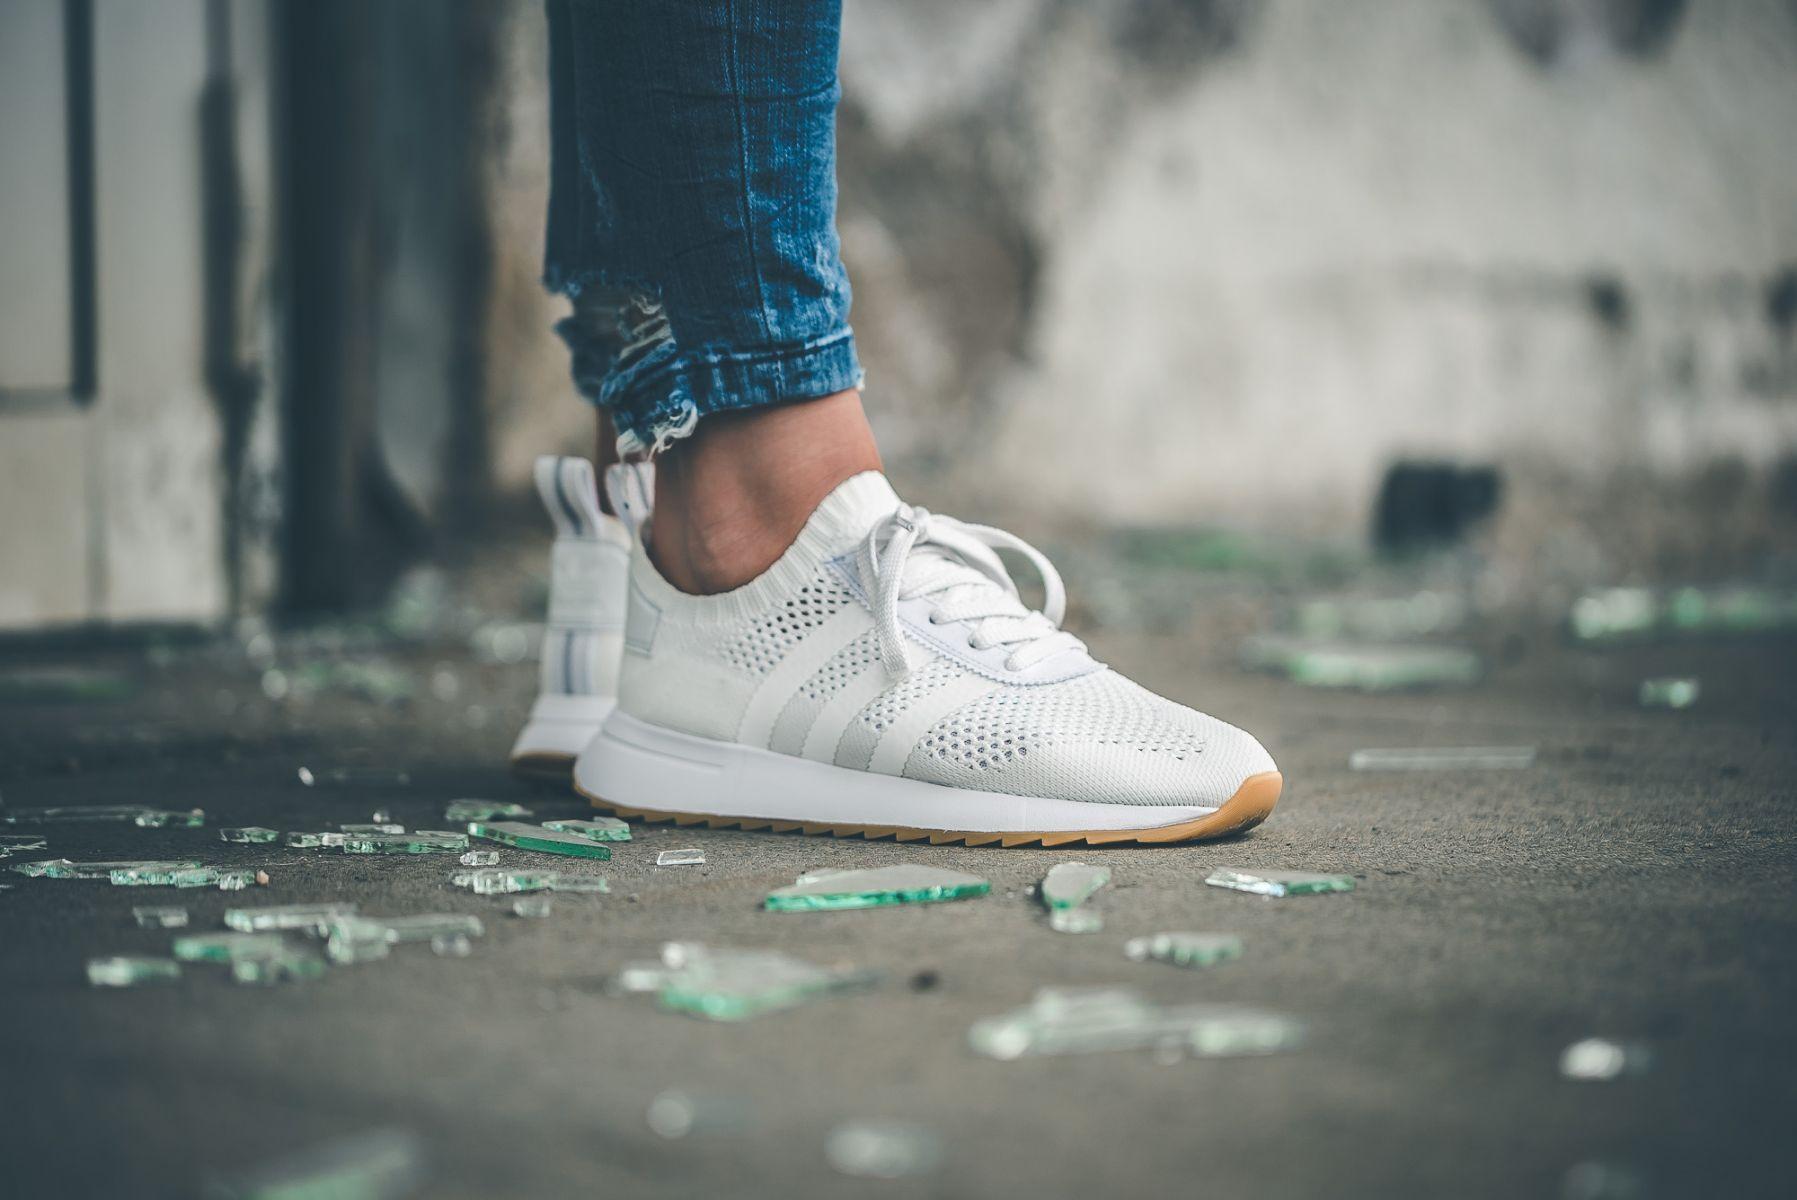 adidas FLB_Runner W PK (weiß) BY2801 | 43einhalb sneaker